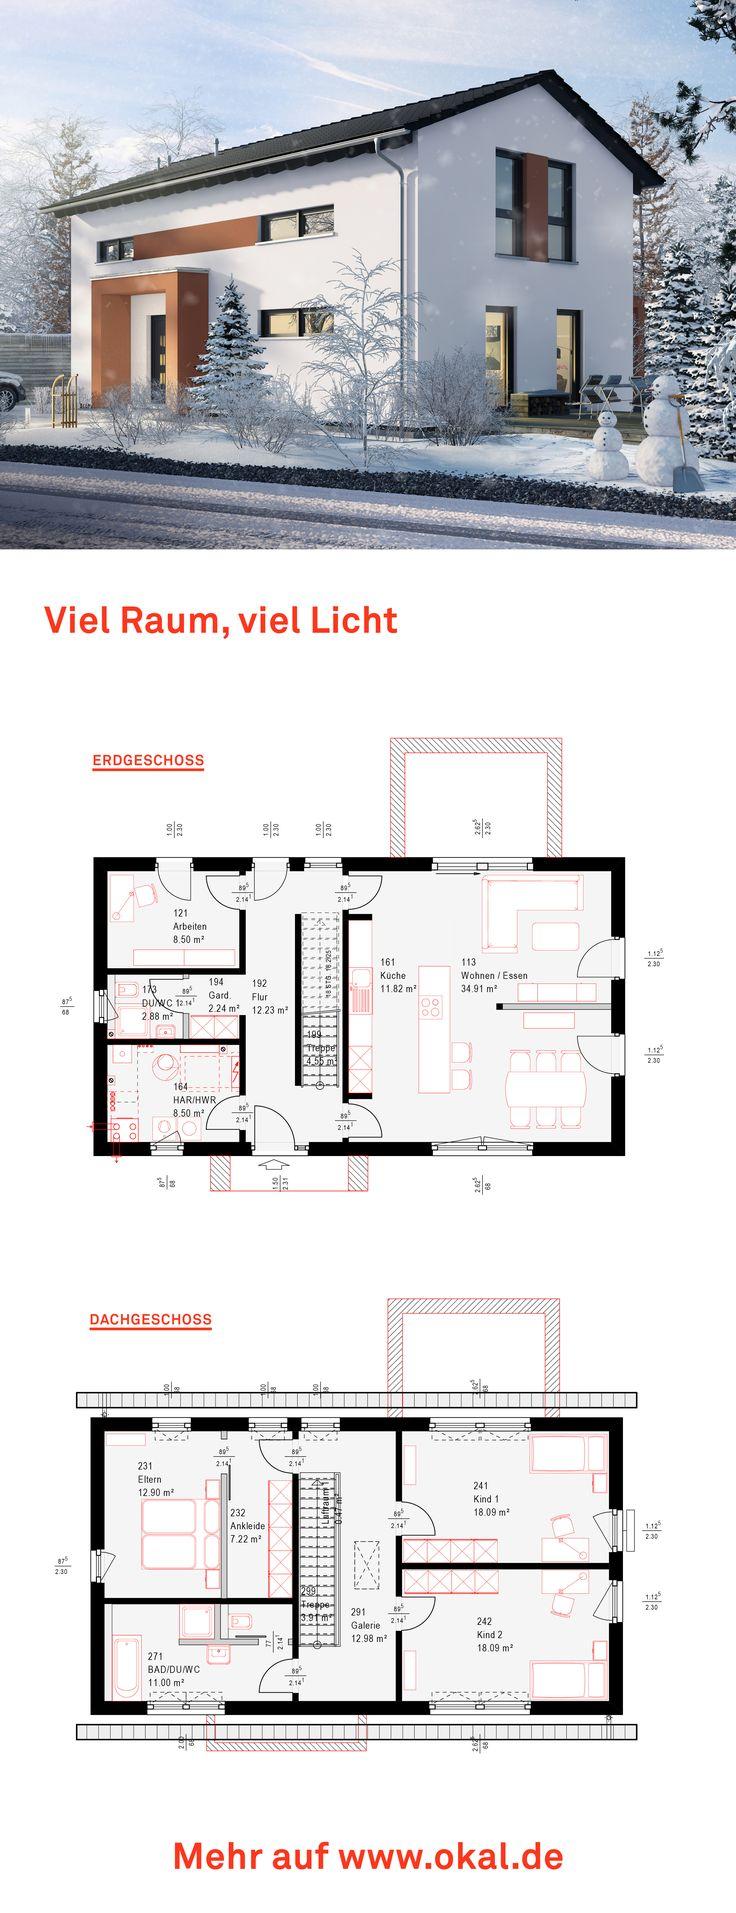 30 fuß vor hause design  best haus images on pinterest  minimalism modern houses and